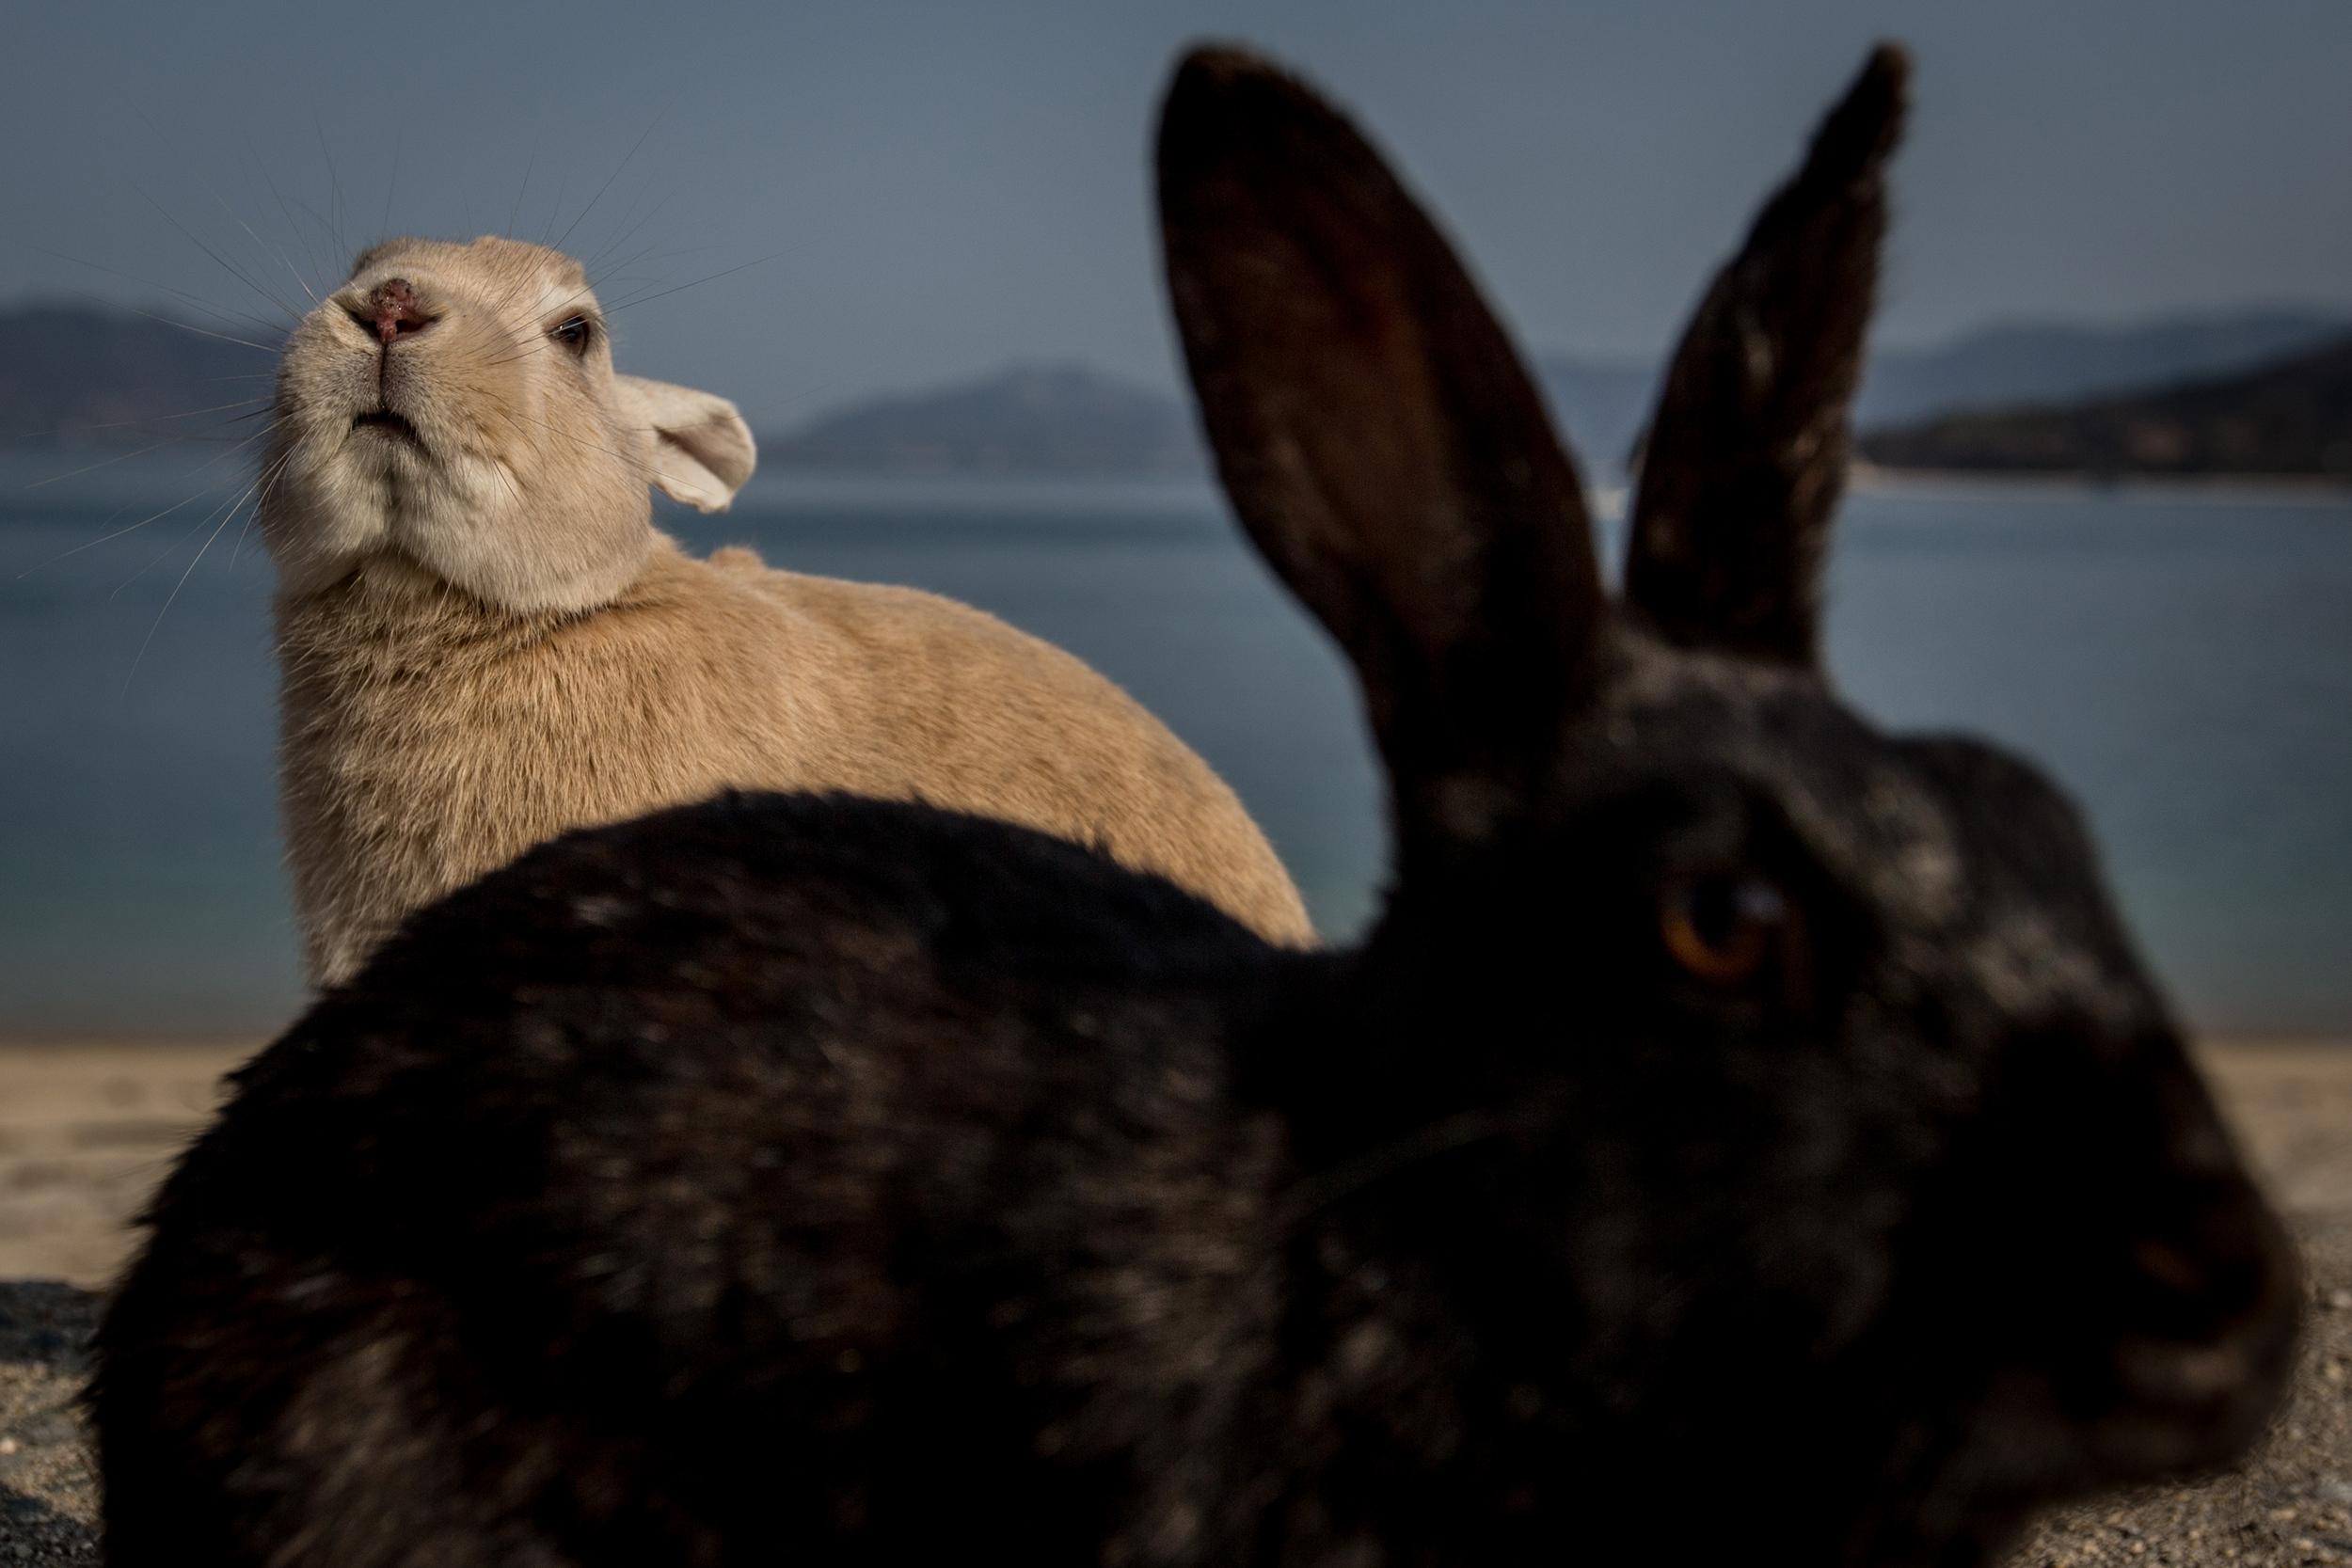 Rabbits look for food at the beach on Okunoshima Island on Feb. 24, 2014 in Takehara, Japan.